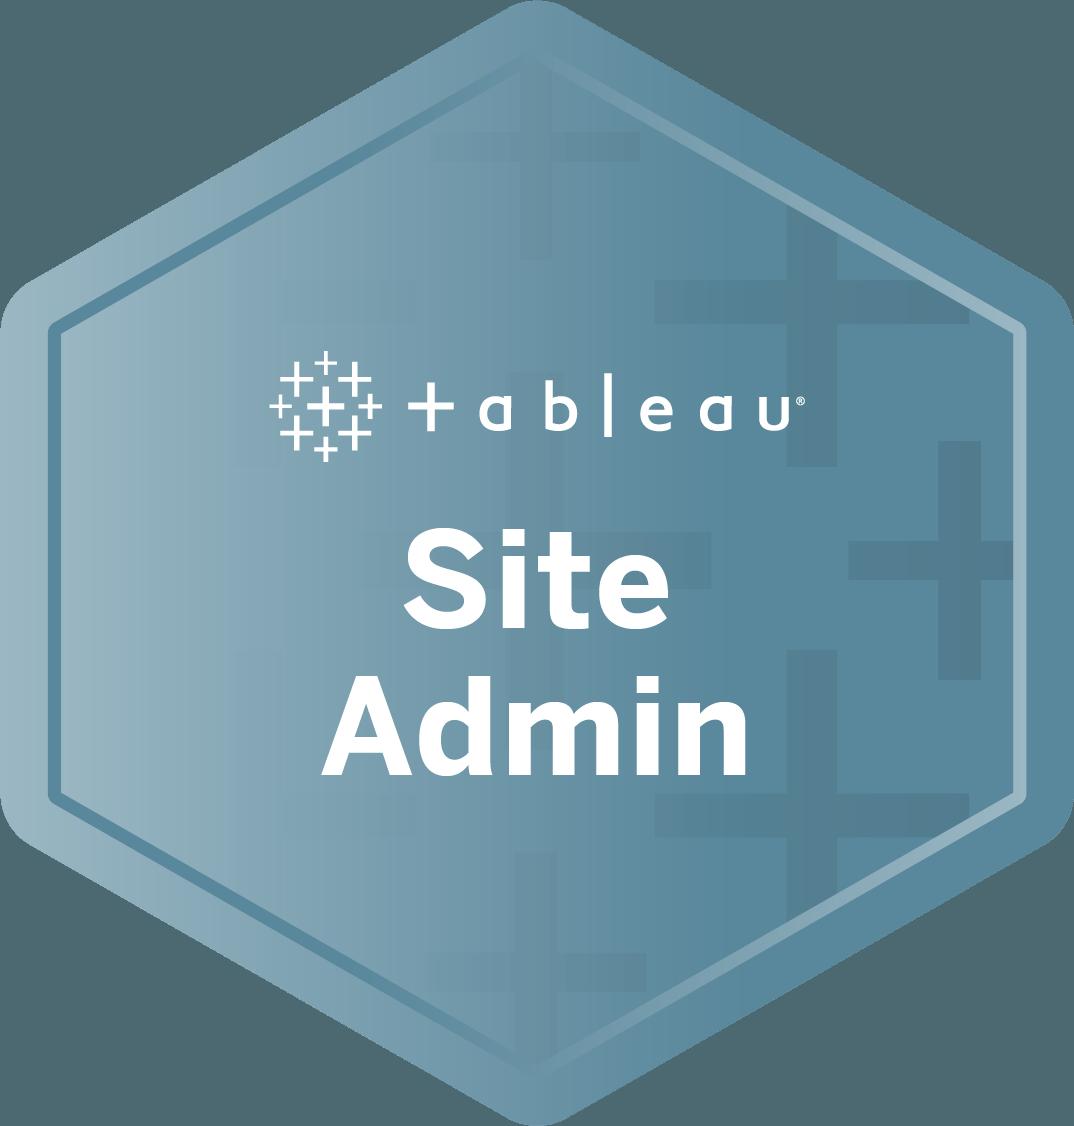 Site Admin badge